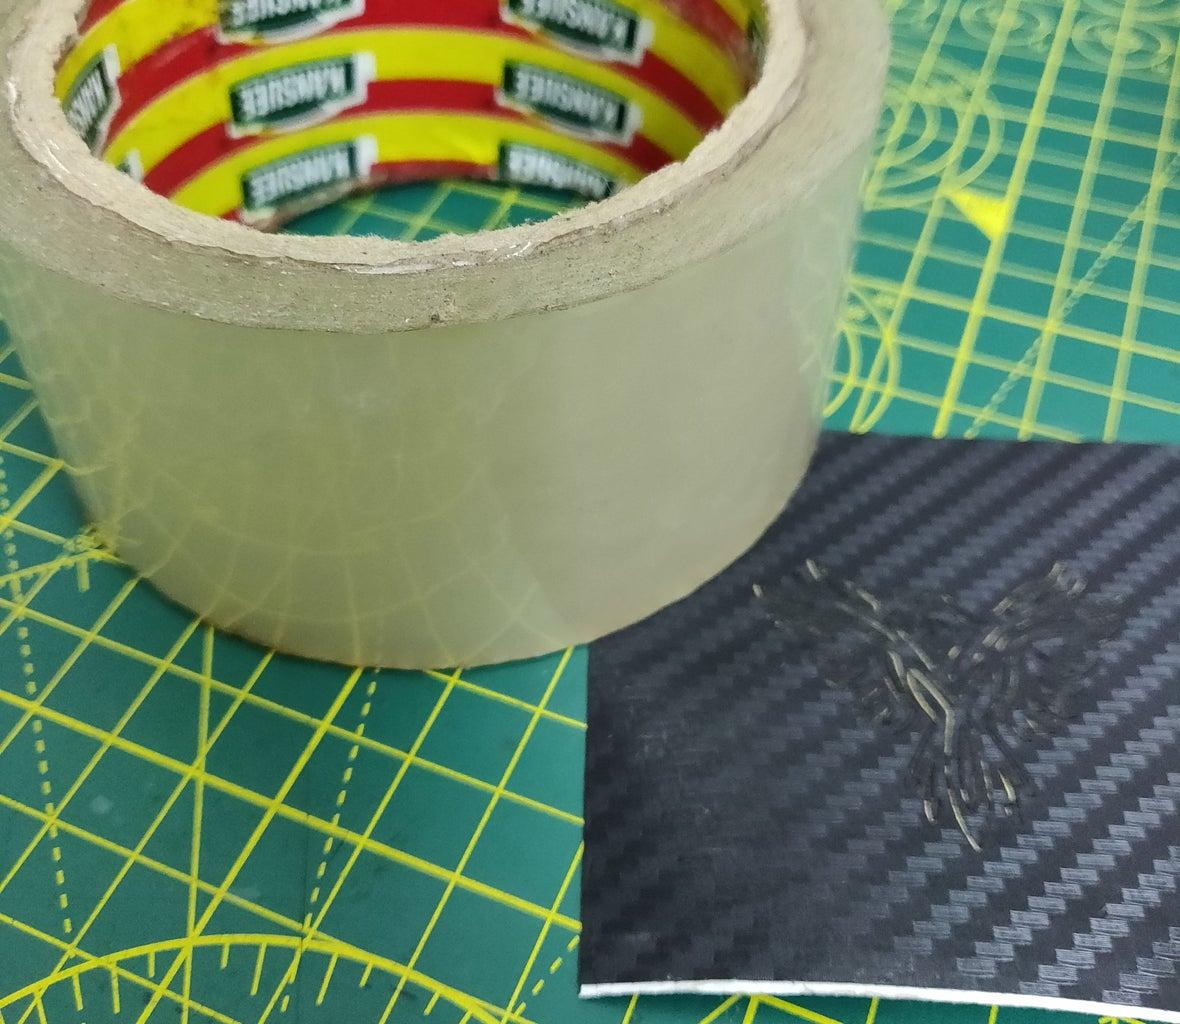 Vinyl Cutting and Making Custom Stickers